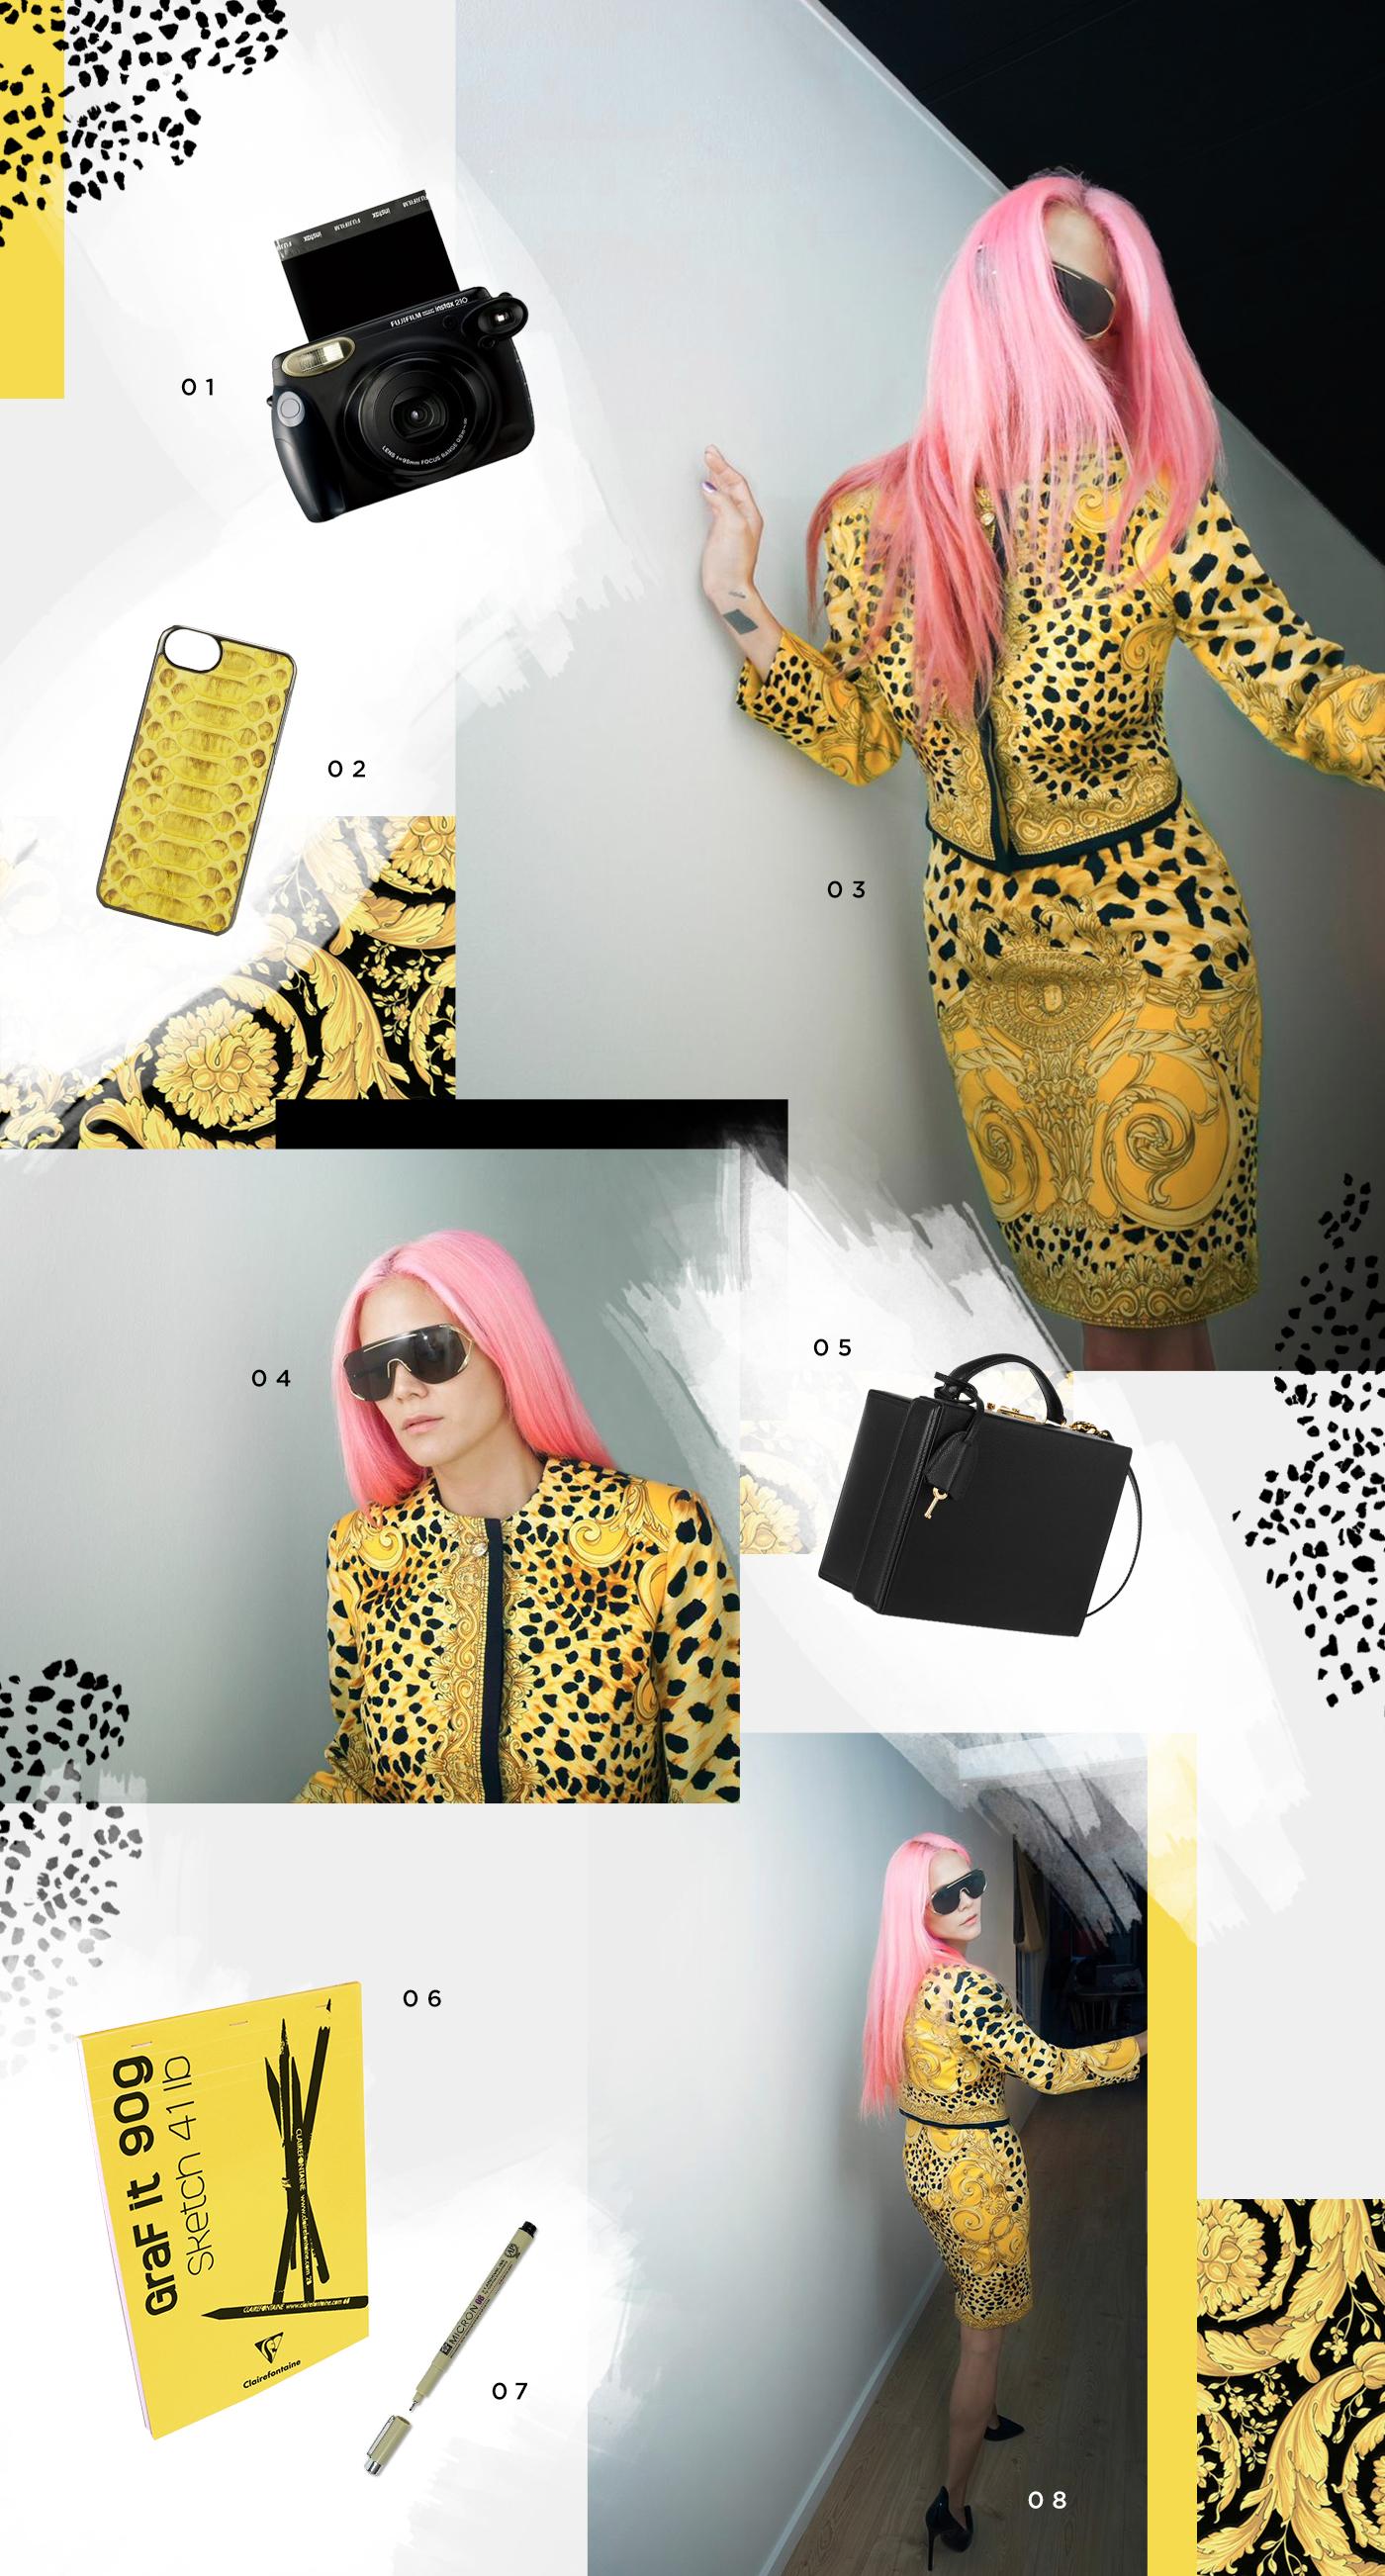 Maison-Mittweg-Looks-Versace-Saint-Laurent-Paris-Fashion-Week-Parties